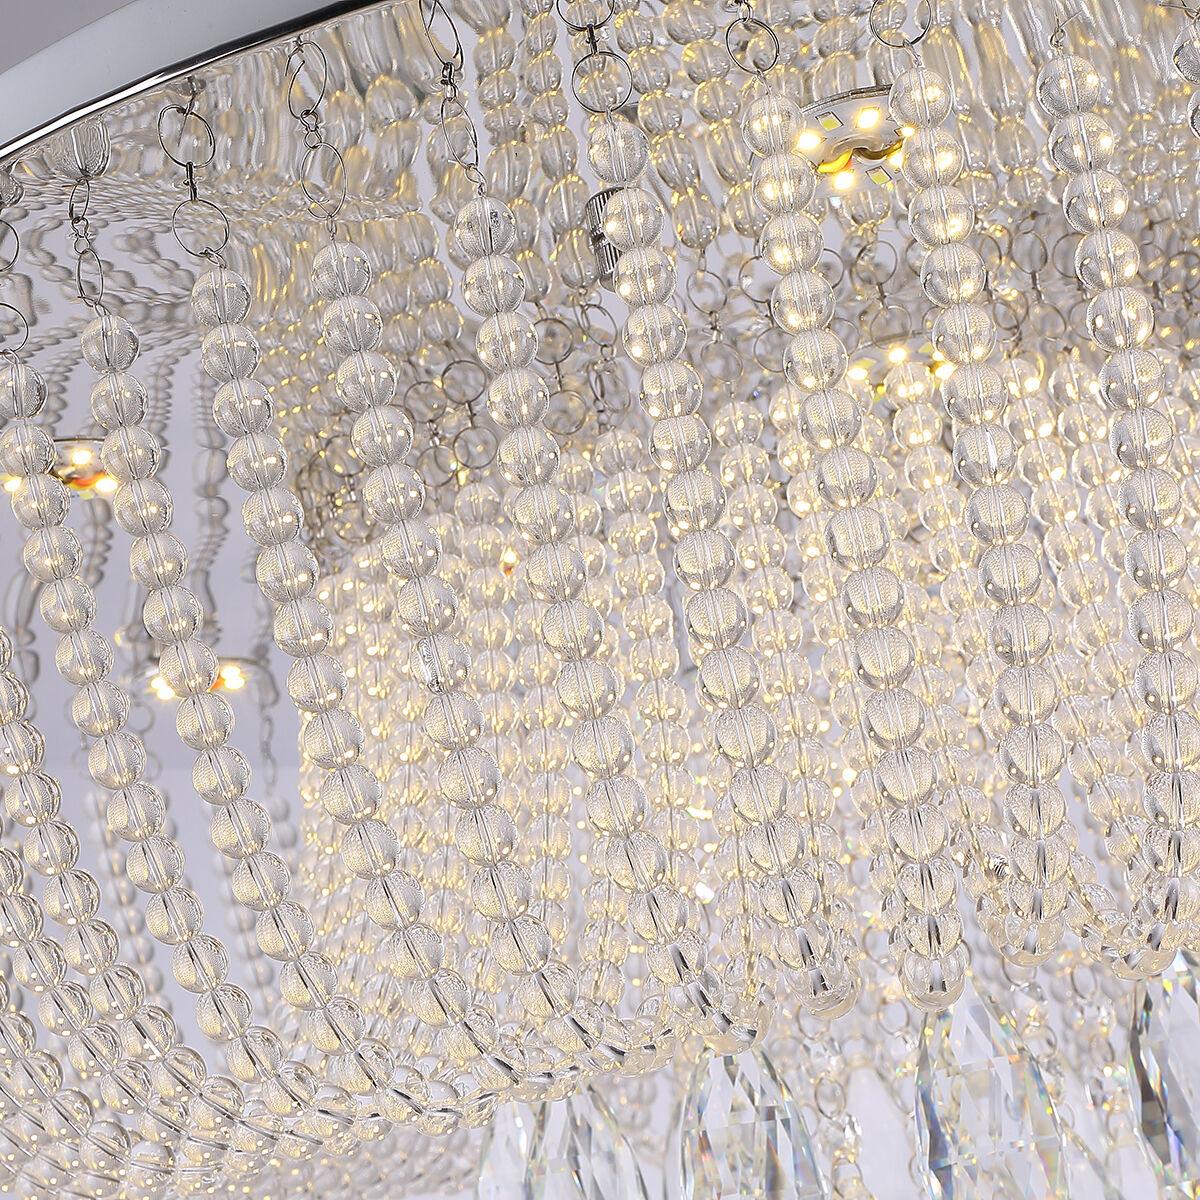 6161 Modern K9 Crystal LED Round Flush Ceiling Light Chandelier 3 Colours + Remote Control (80cm 42W)